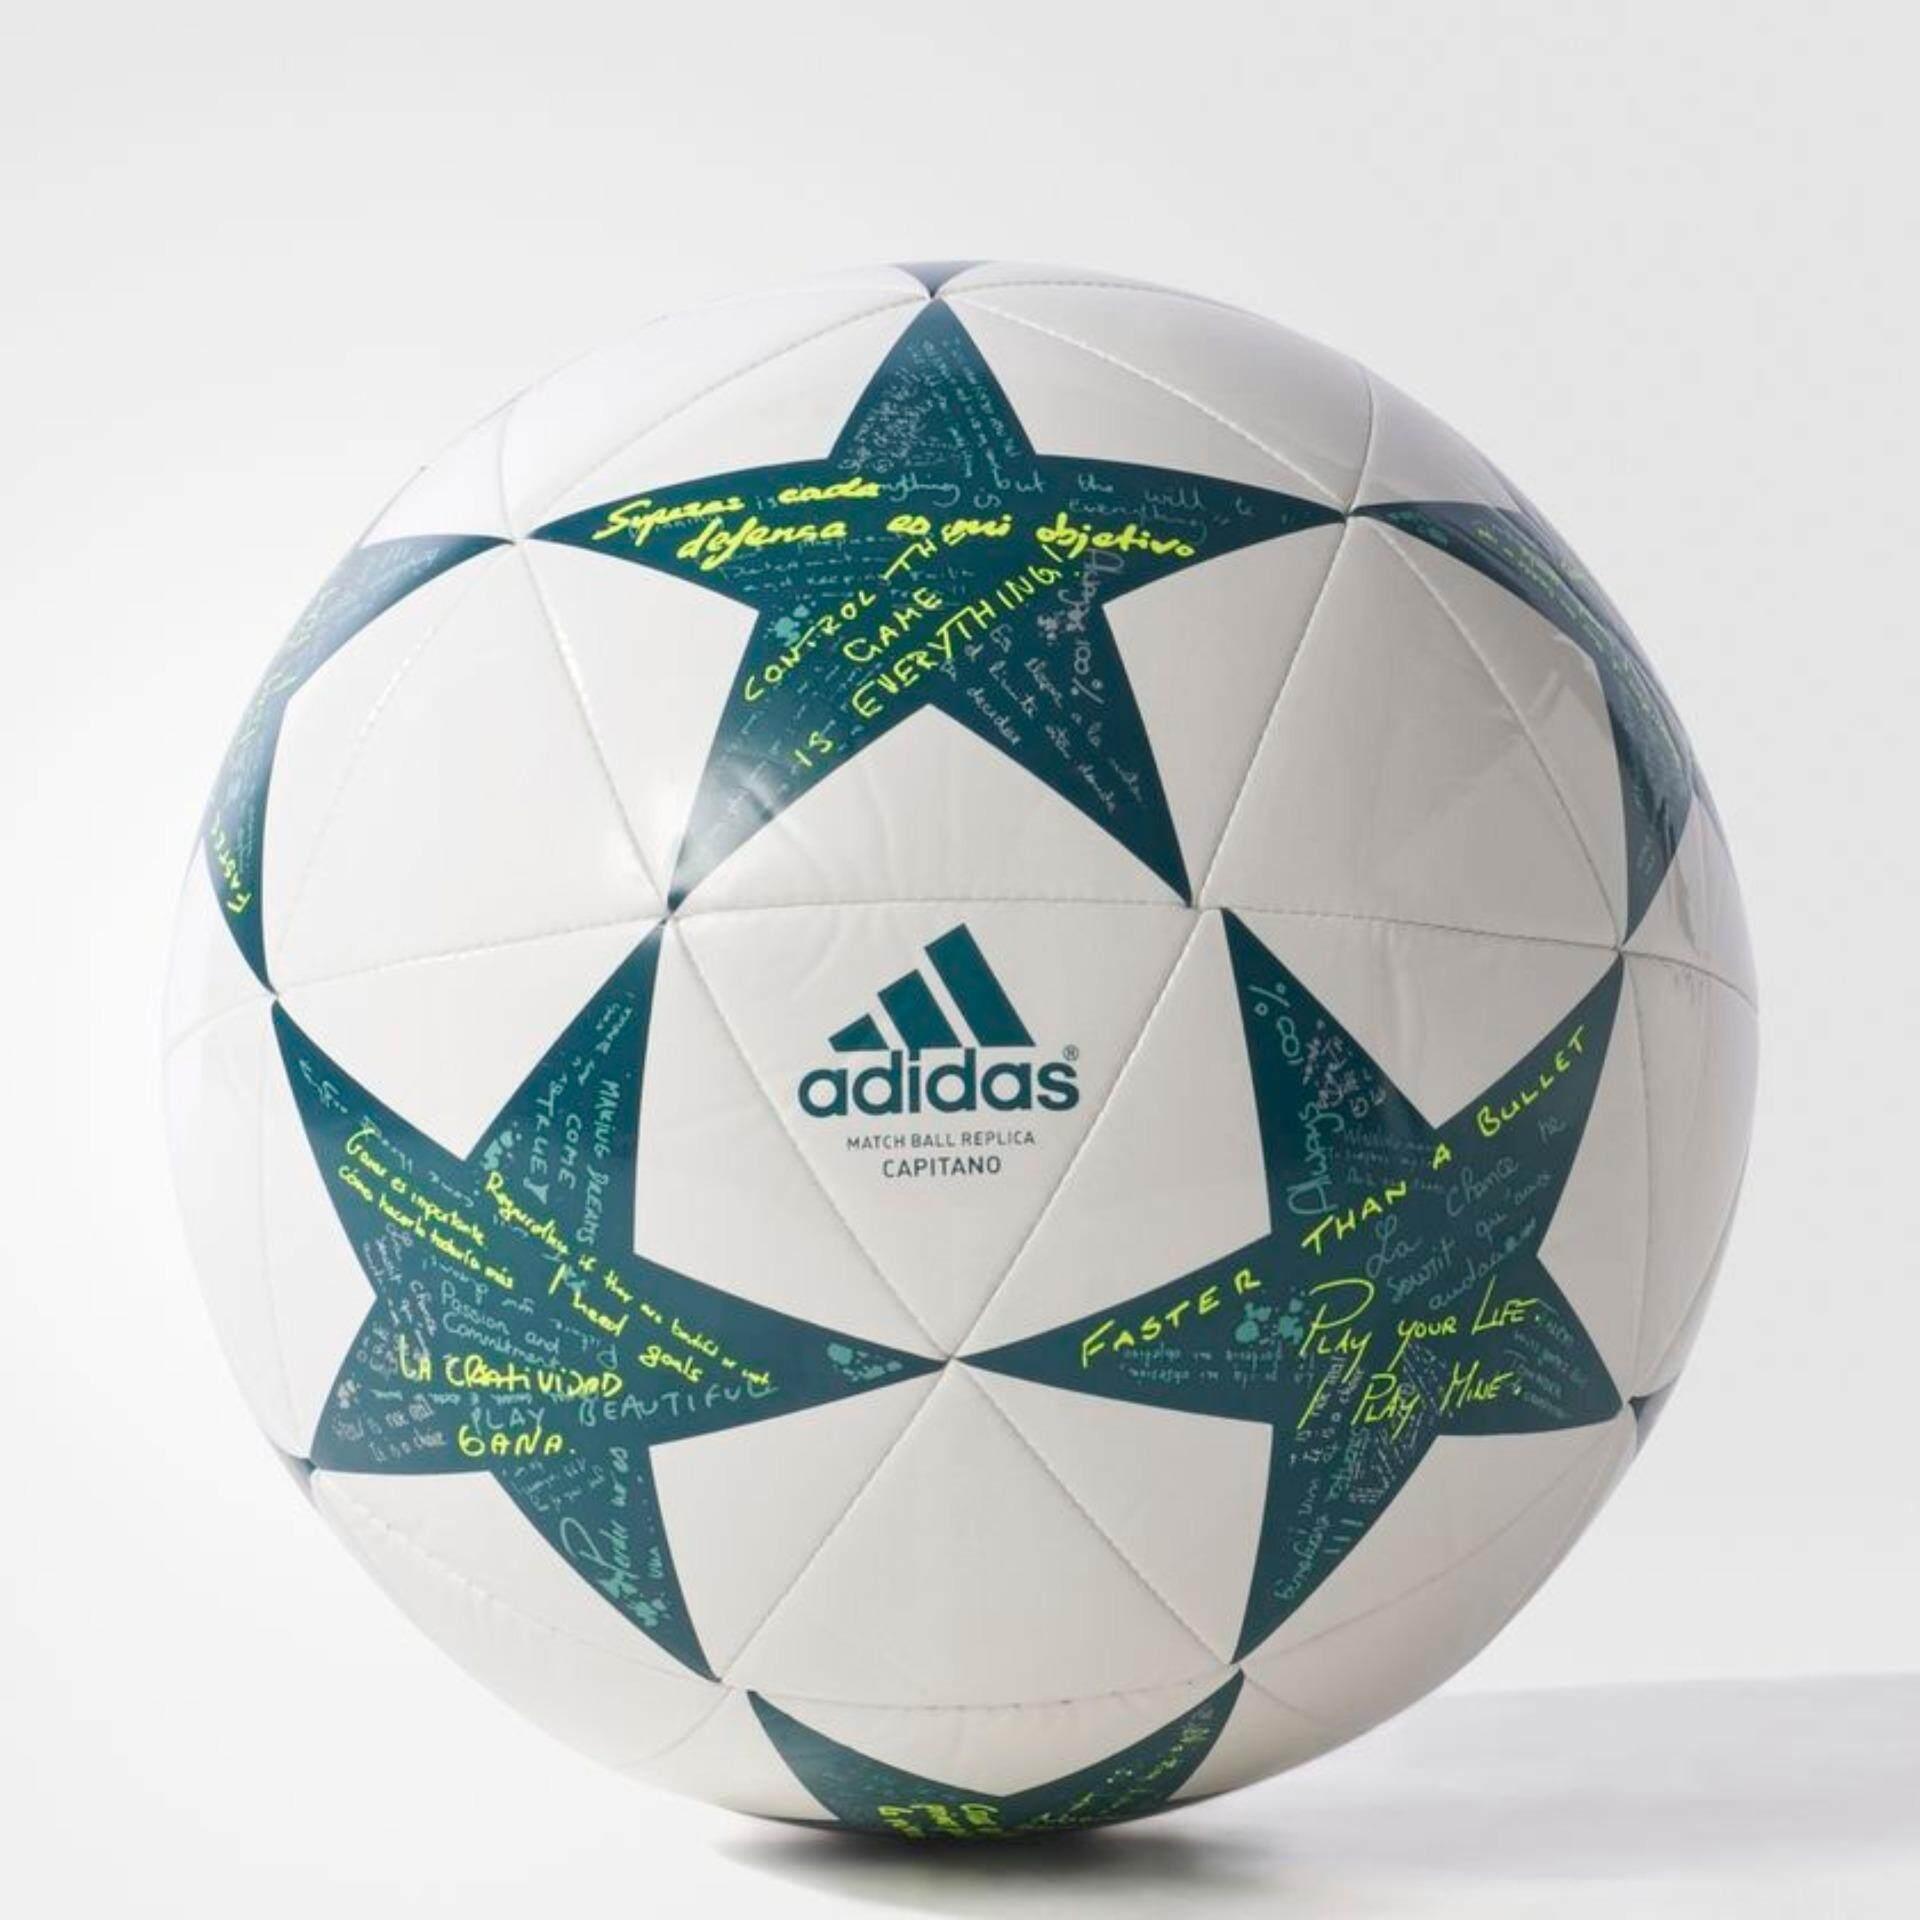 5cffa33591 Adidas Footballs price in Malaysia - Best Adidas Footballs